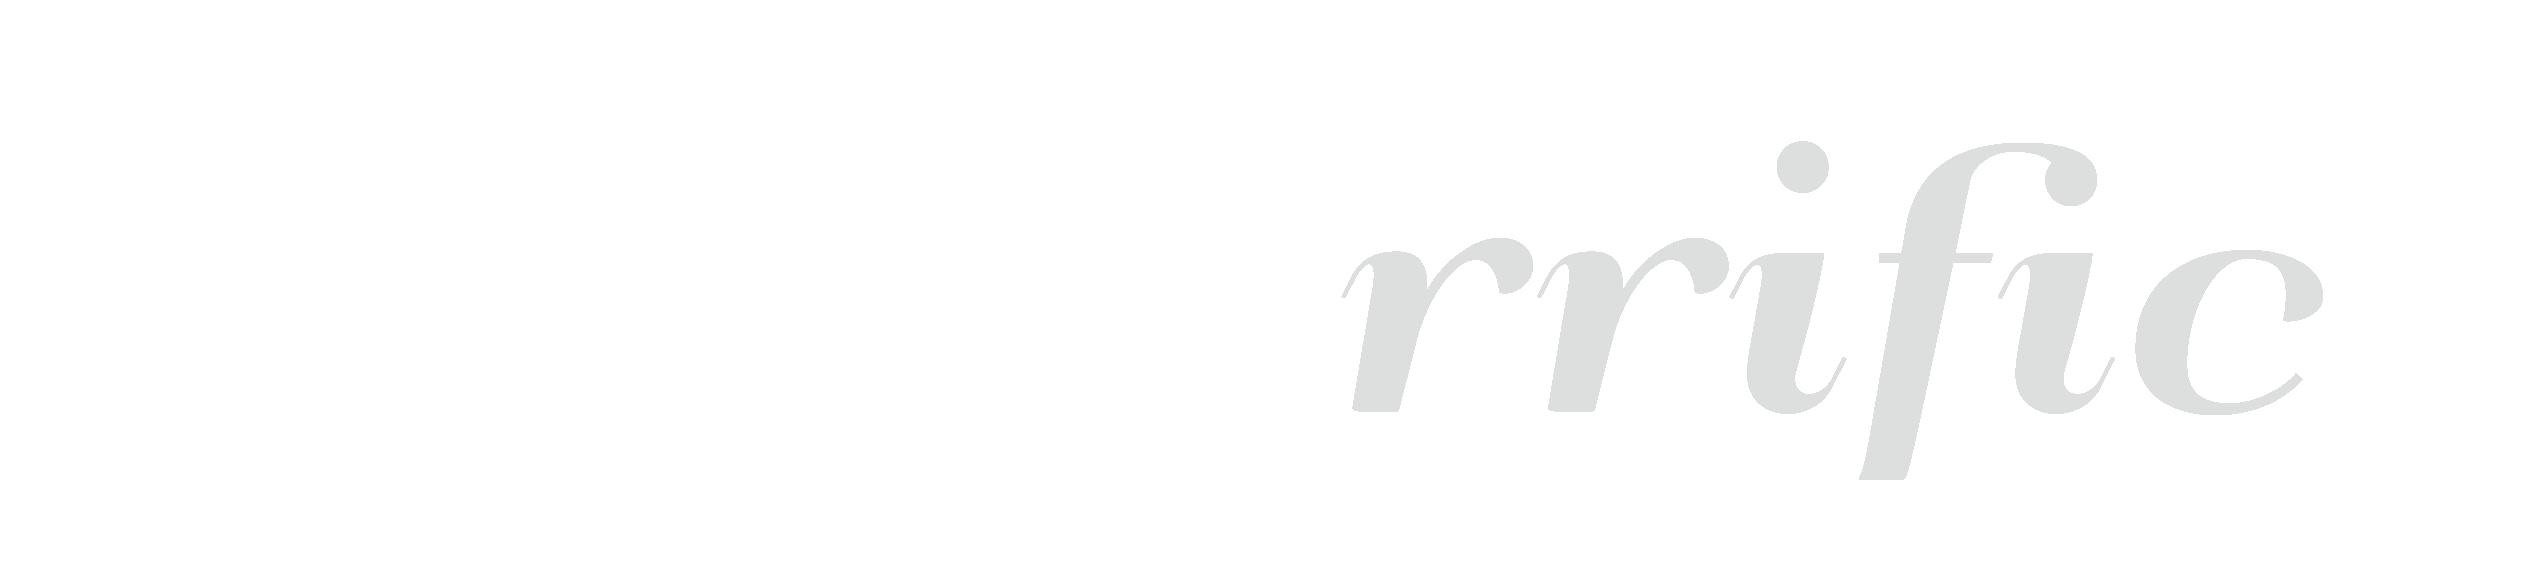 Latinarrific